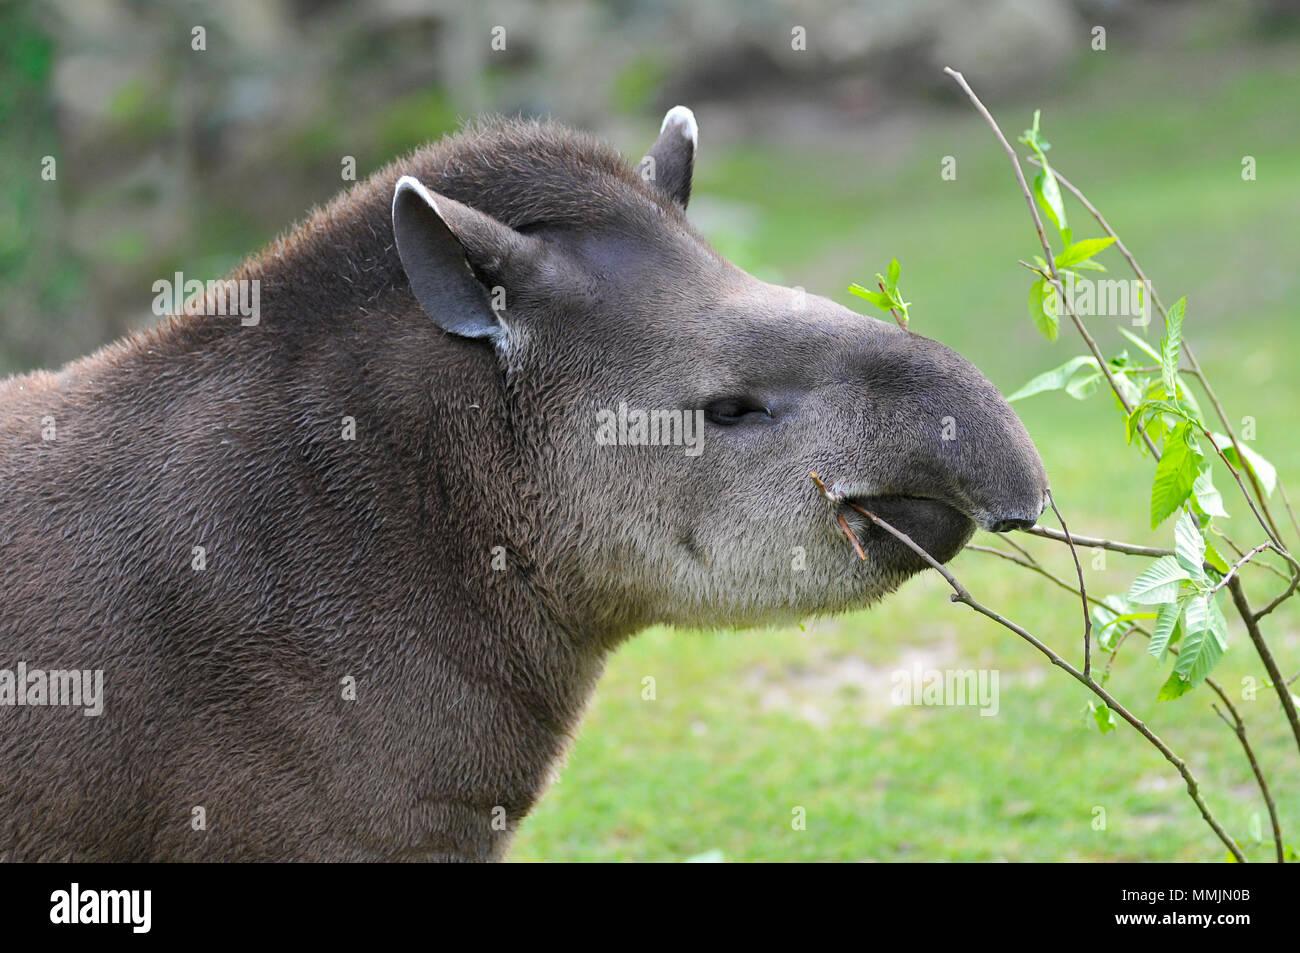 Profile portrait of south American tapir (Tapirus terrestris) eating leaves - Stock Image